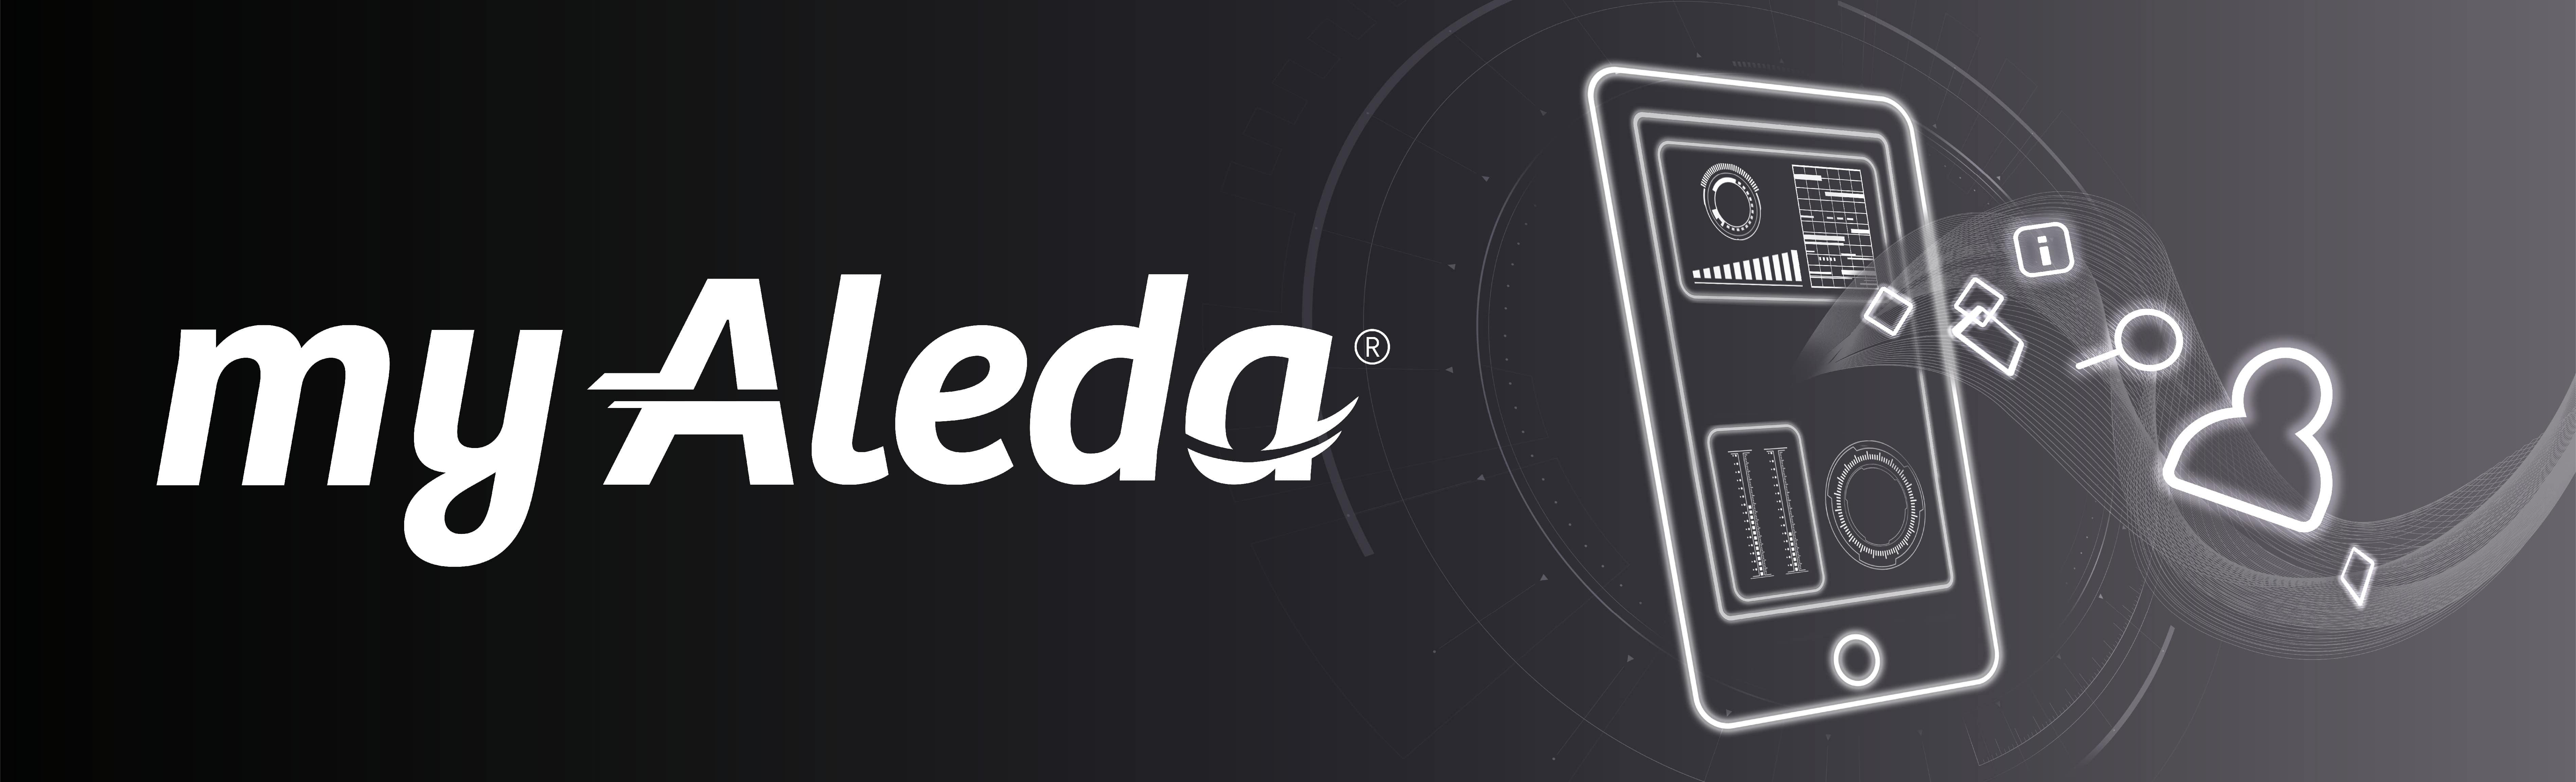 my-aleda--ambassadeur-identite-visuelle-logo-charte-graphique-univers-reference